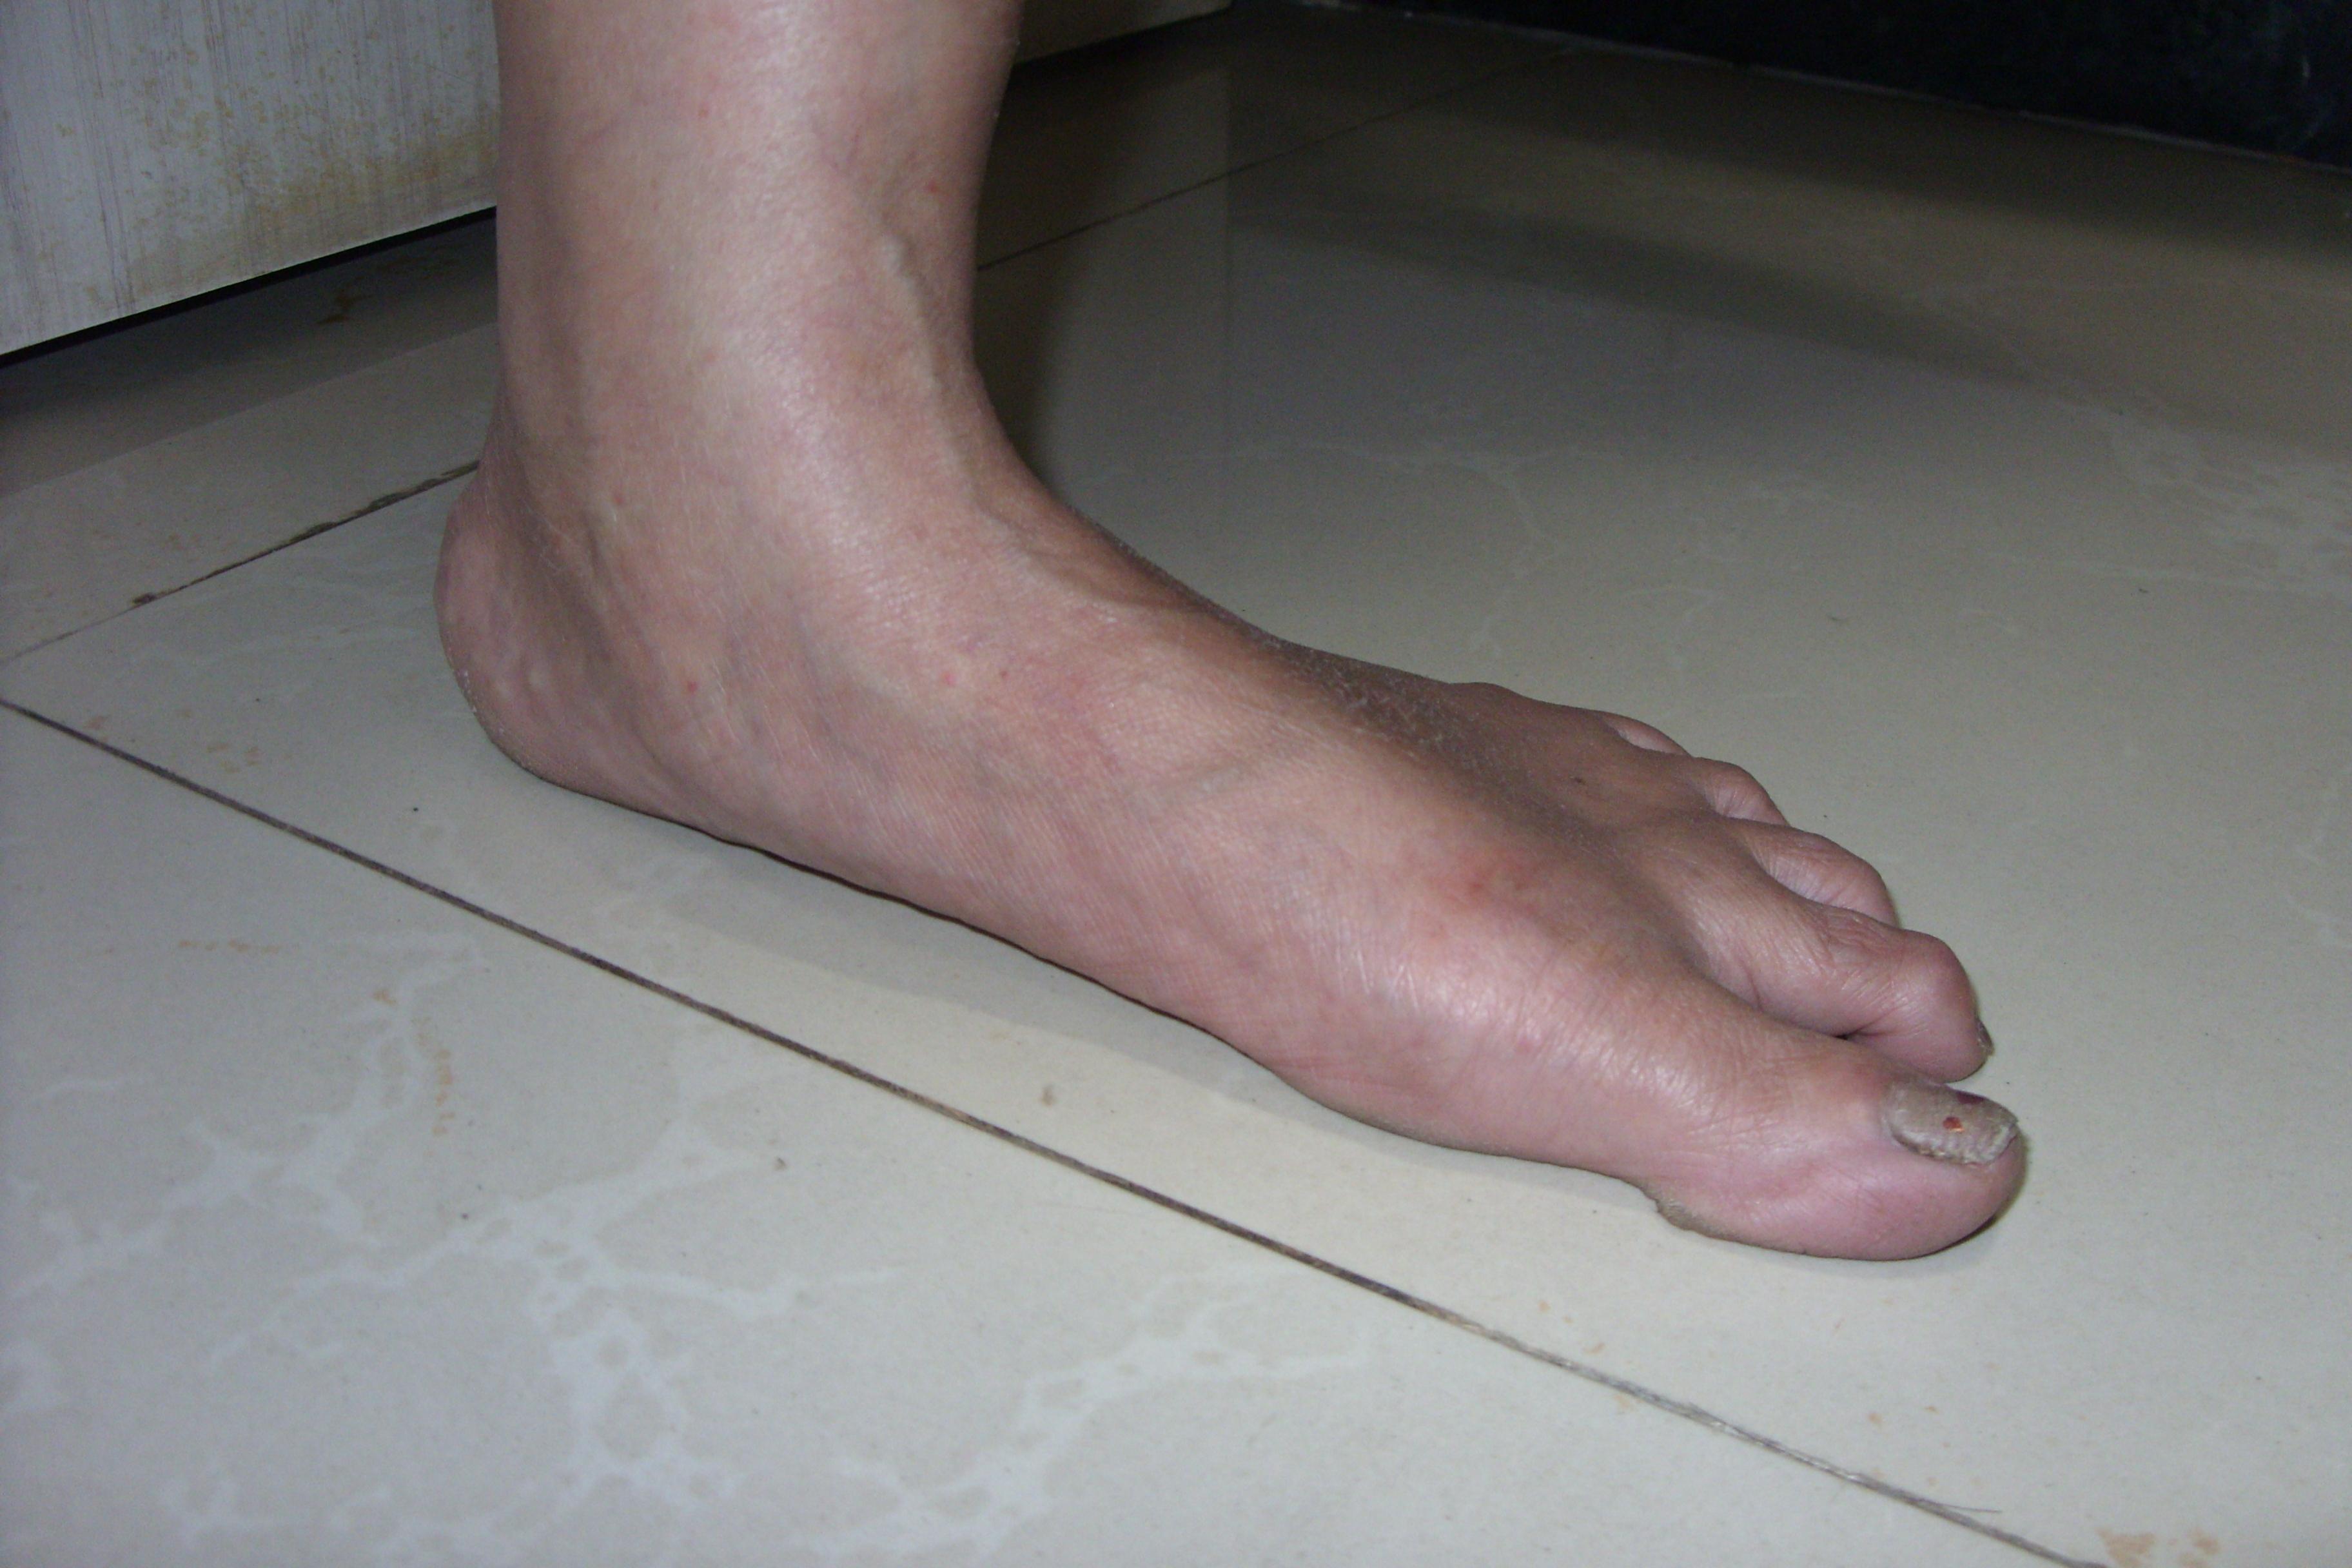 pes planus symptoms